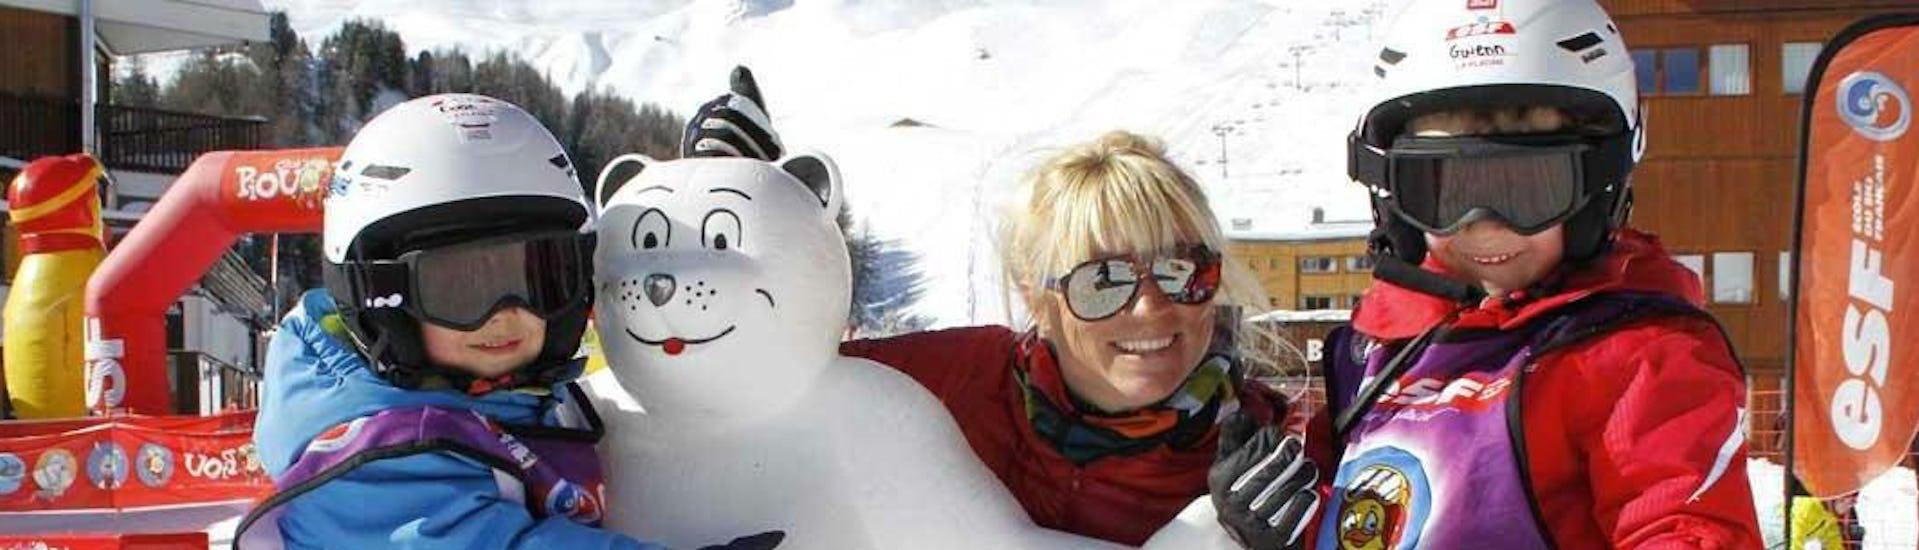 "Cours d'Essai Ski ""Piou Piou"" (3 à 4 ans) - Basse-saison"